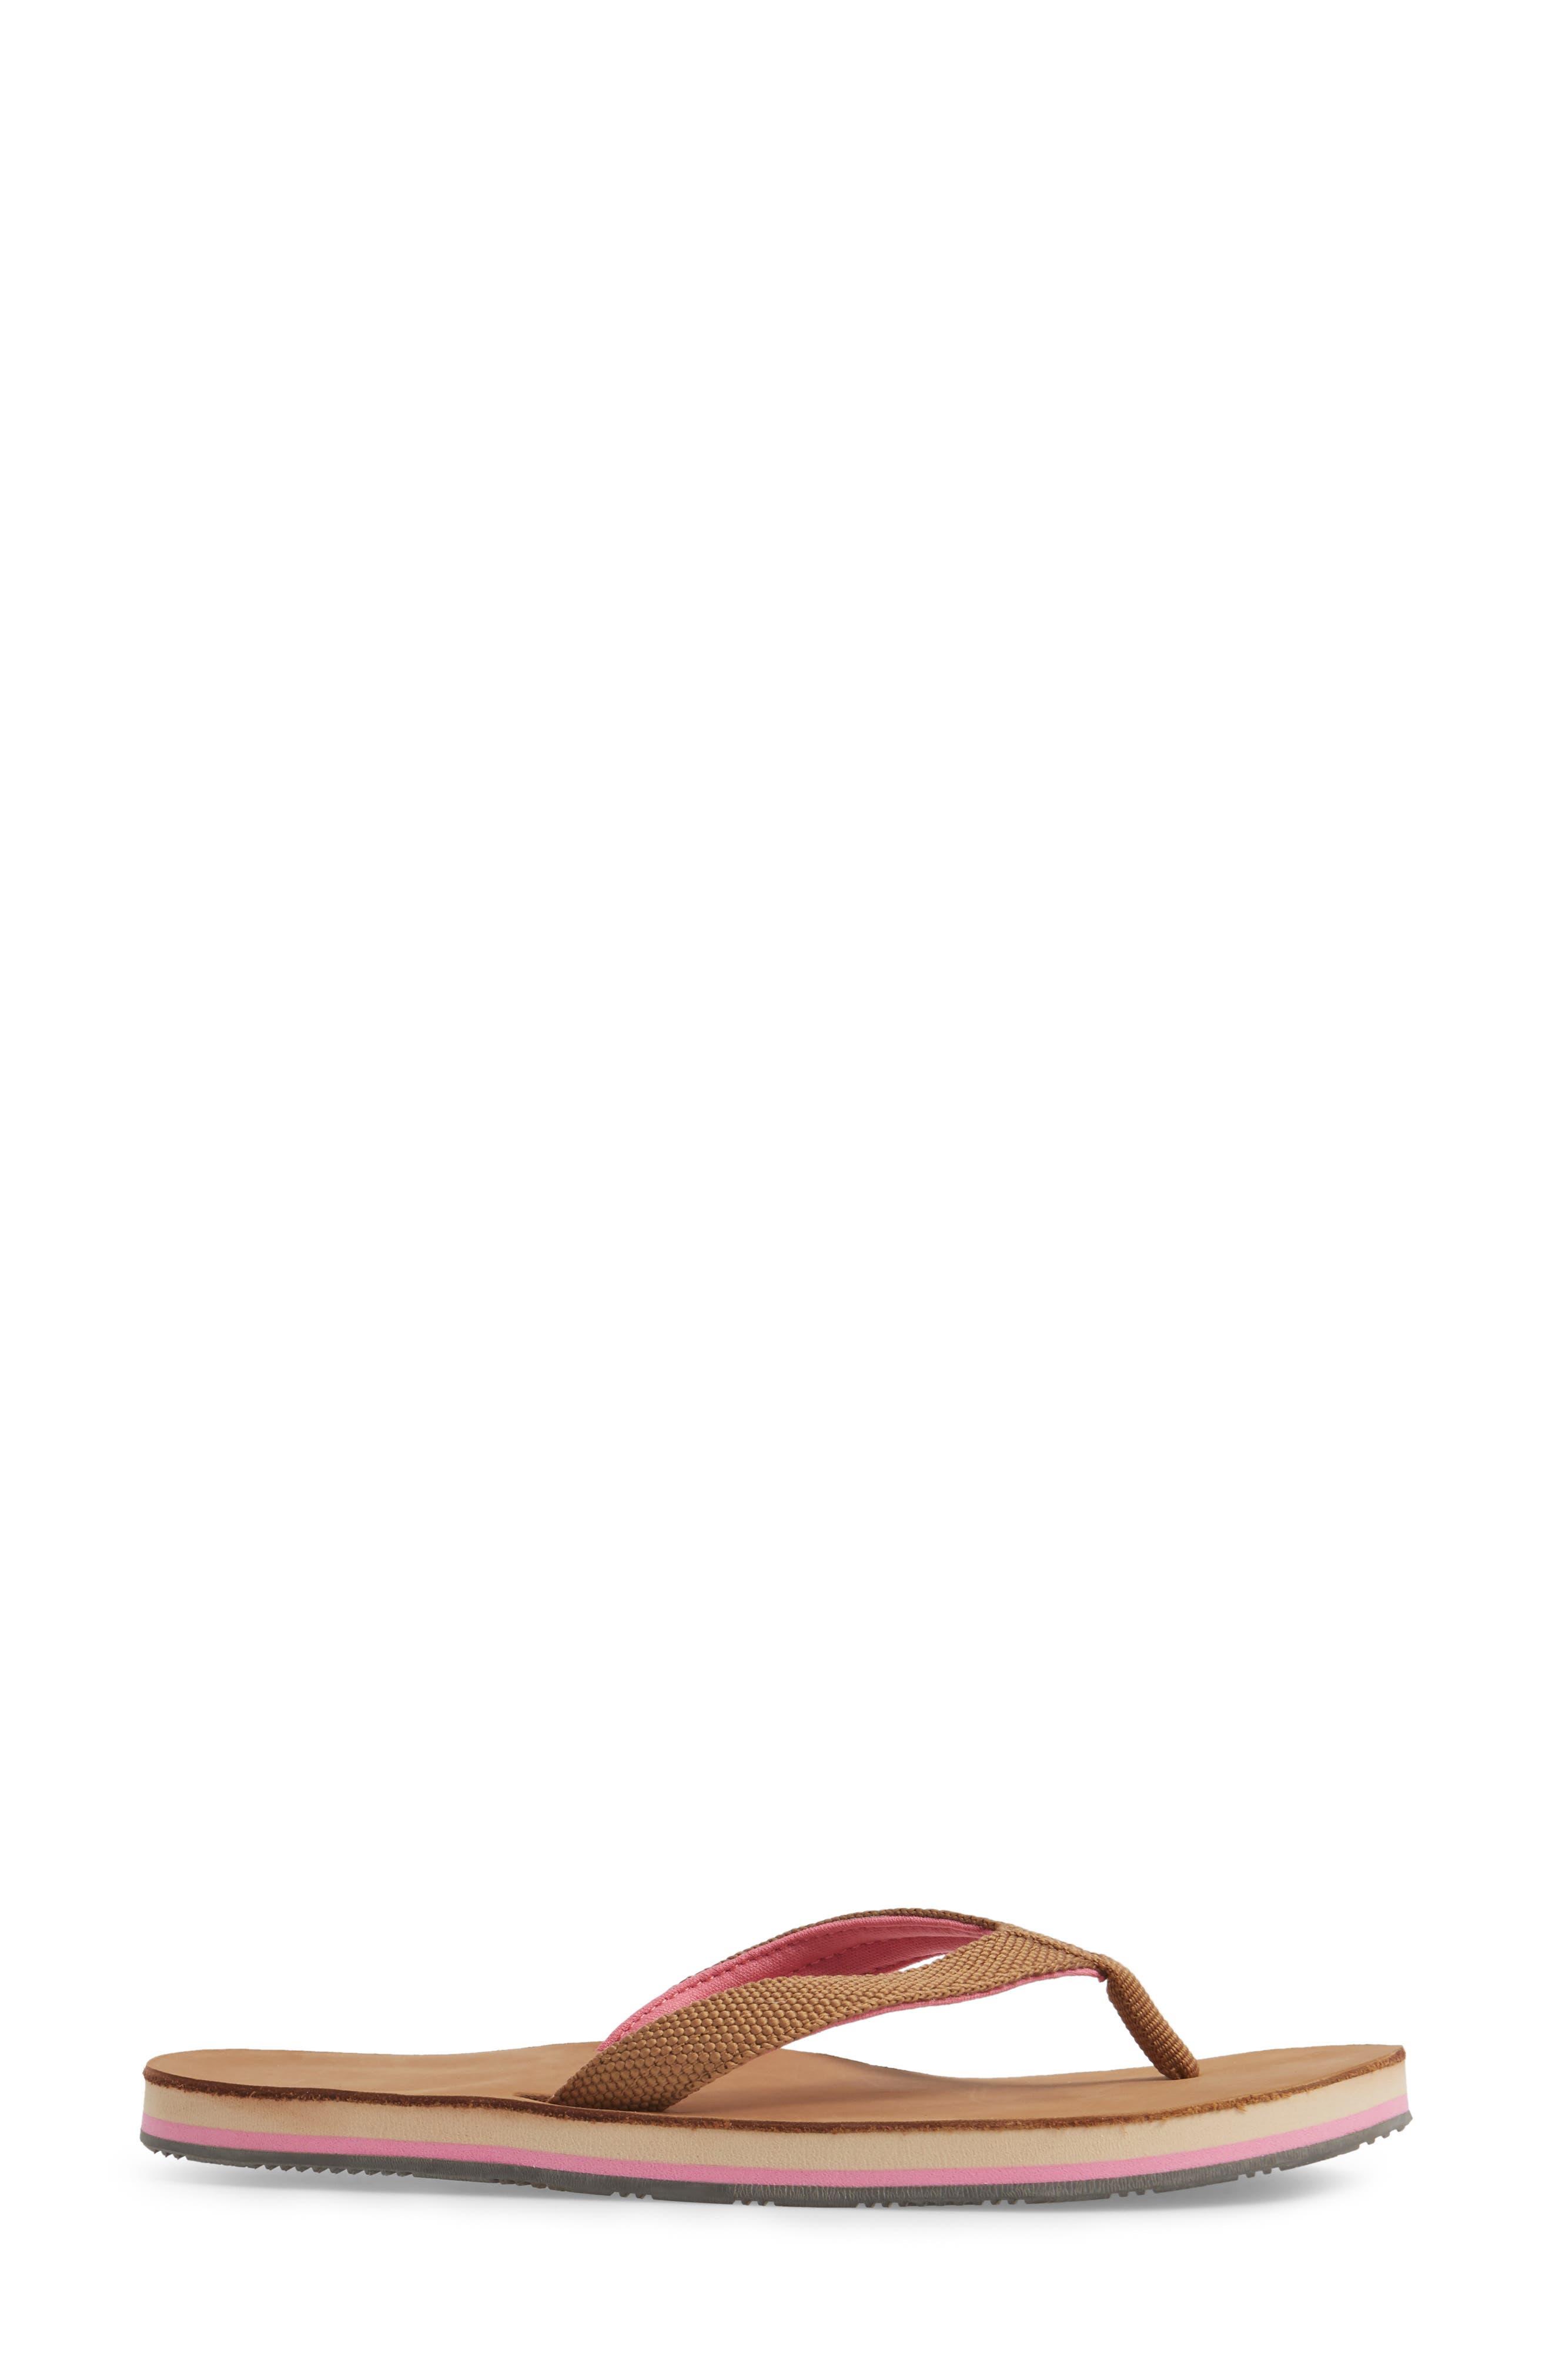 Scouts Flip Flop,                             Alternate thumbnail 3, color,                             Tan/ Shell Pink